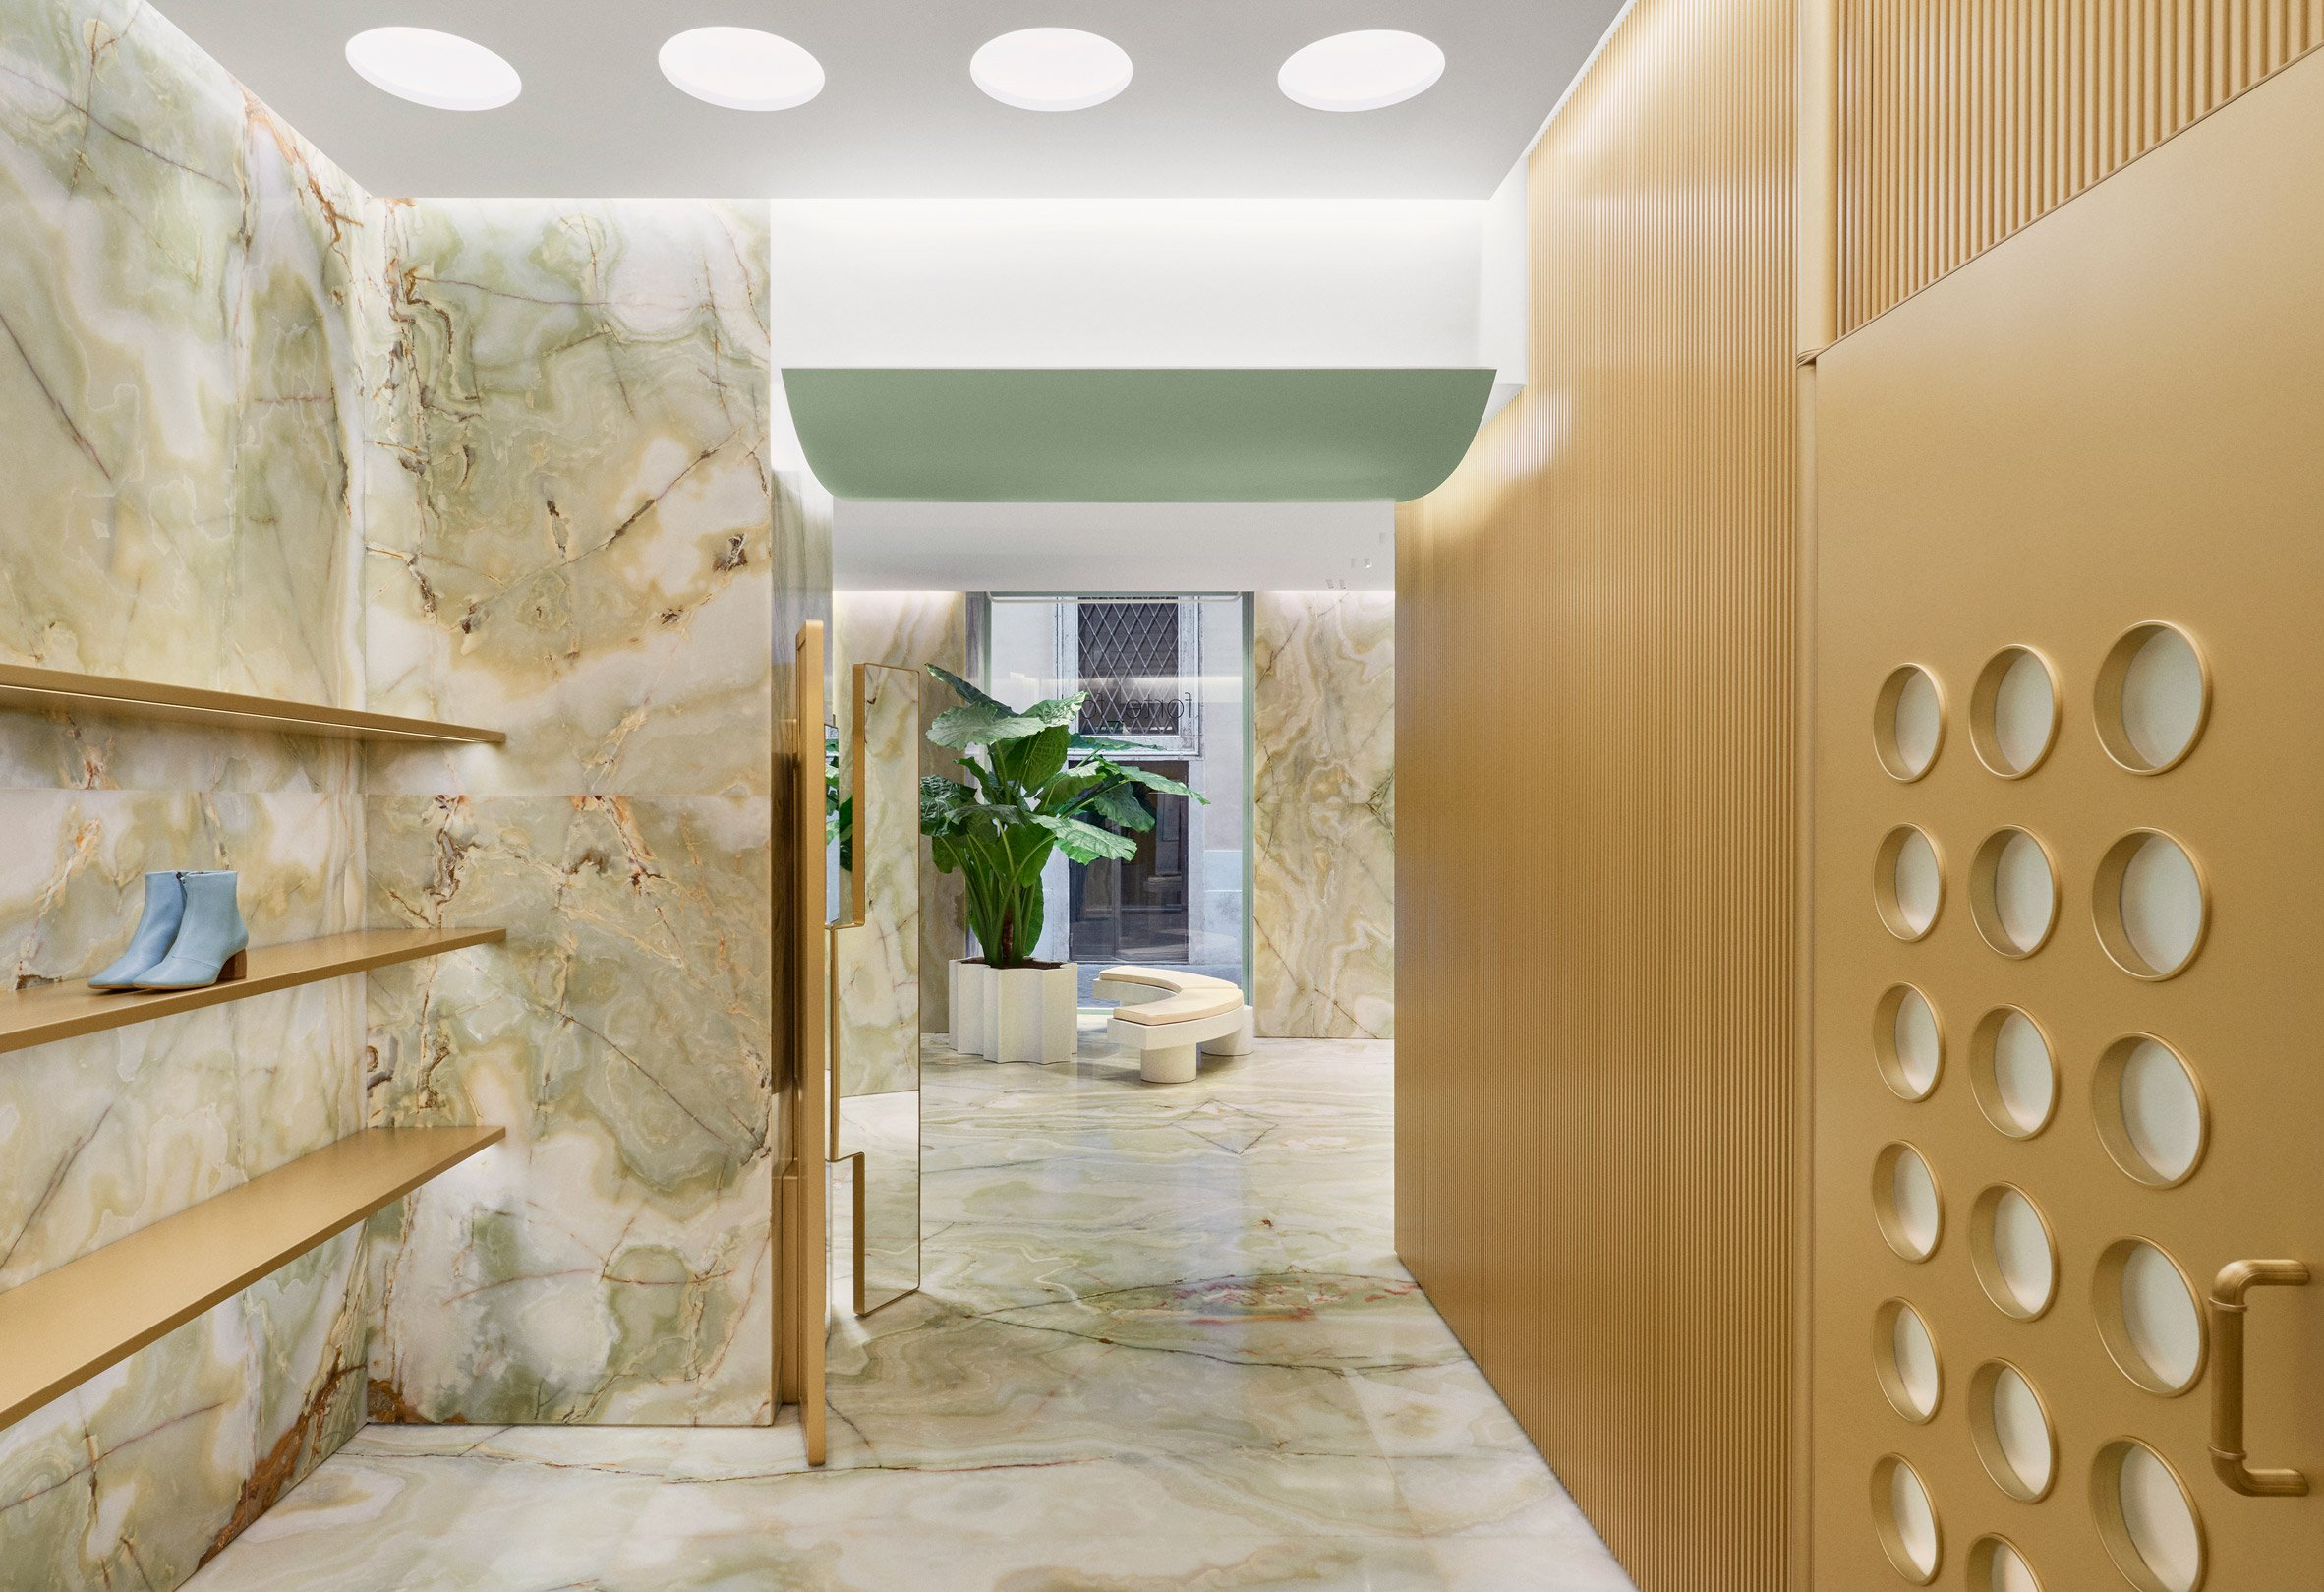 Circular details are built into doors